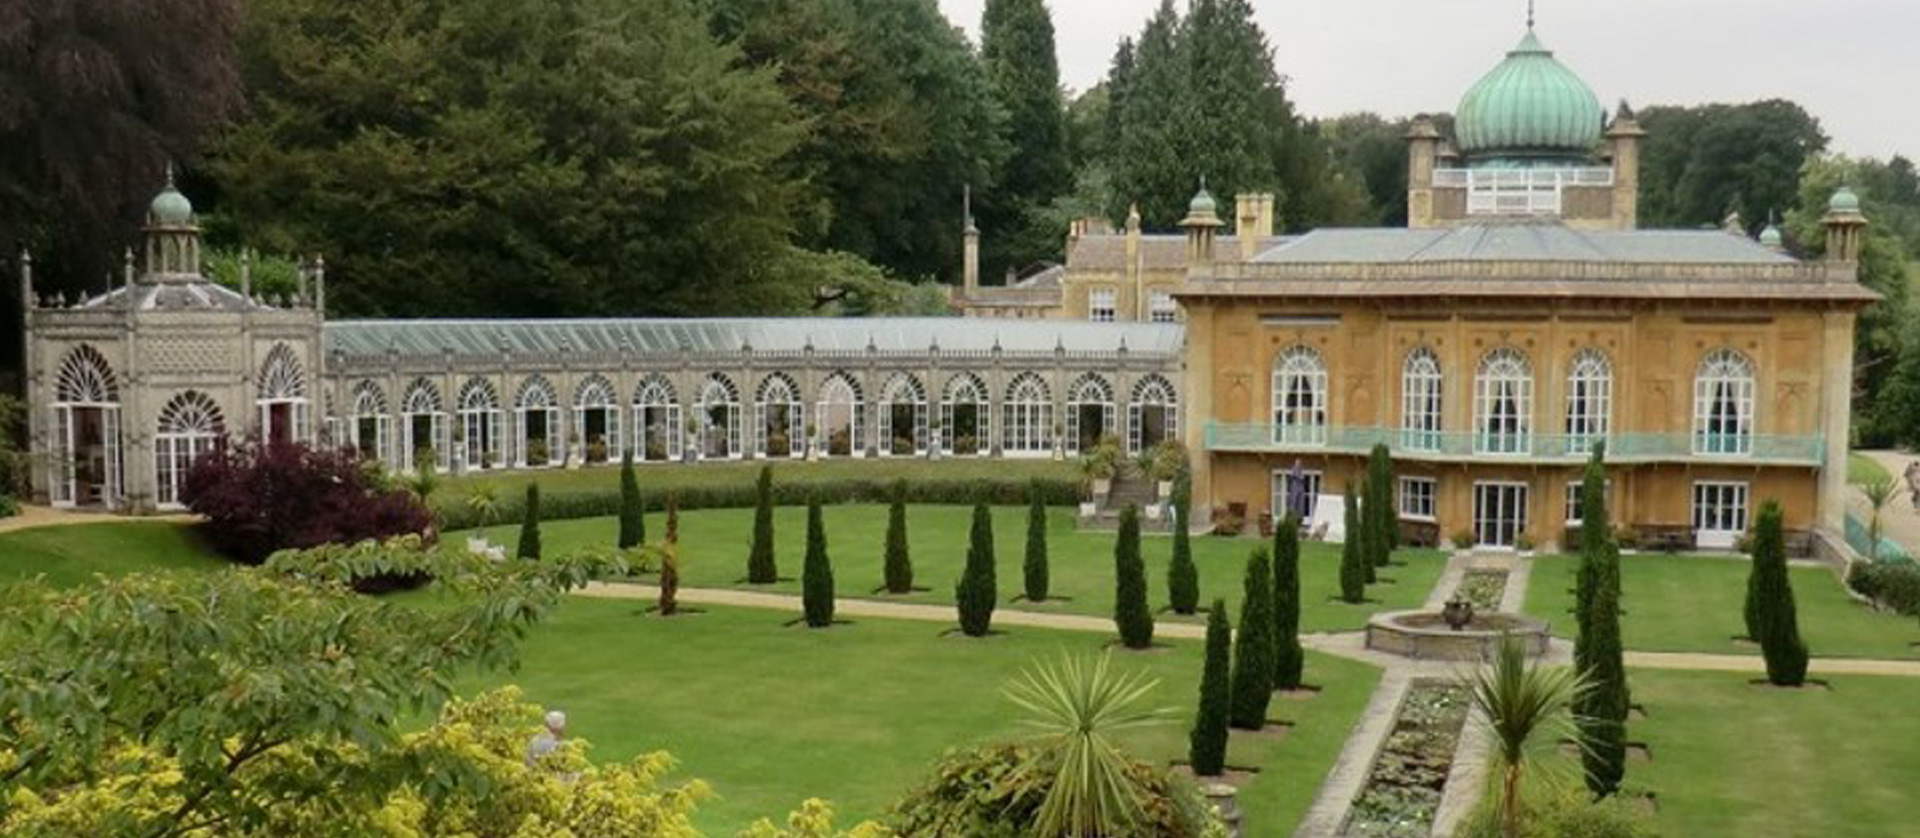 John-Horsey-Horticulture-Garden-History-Somerset